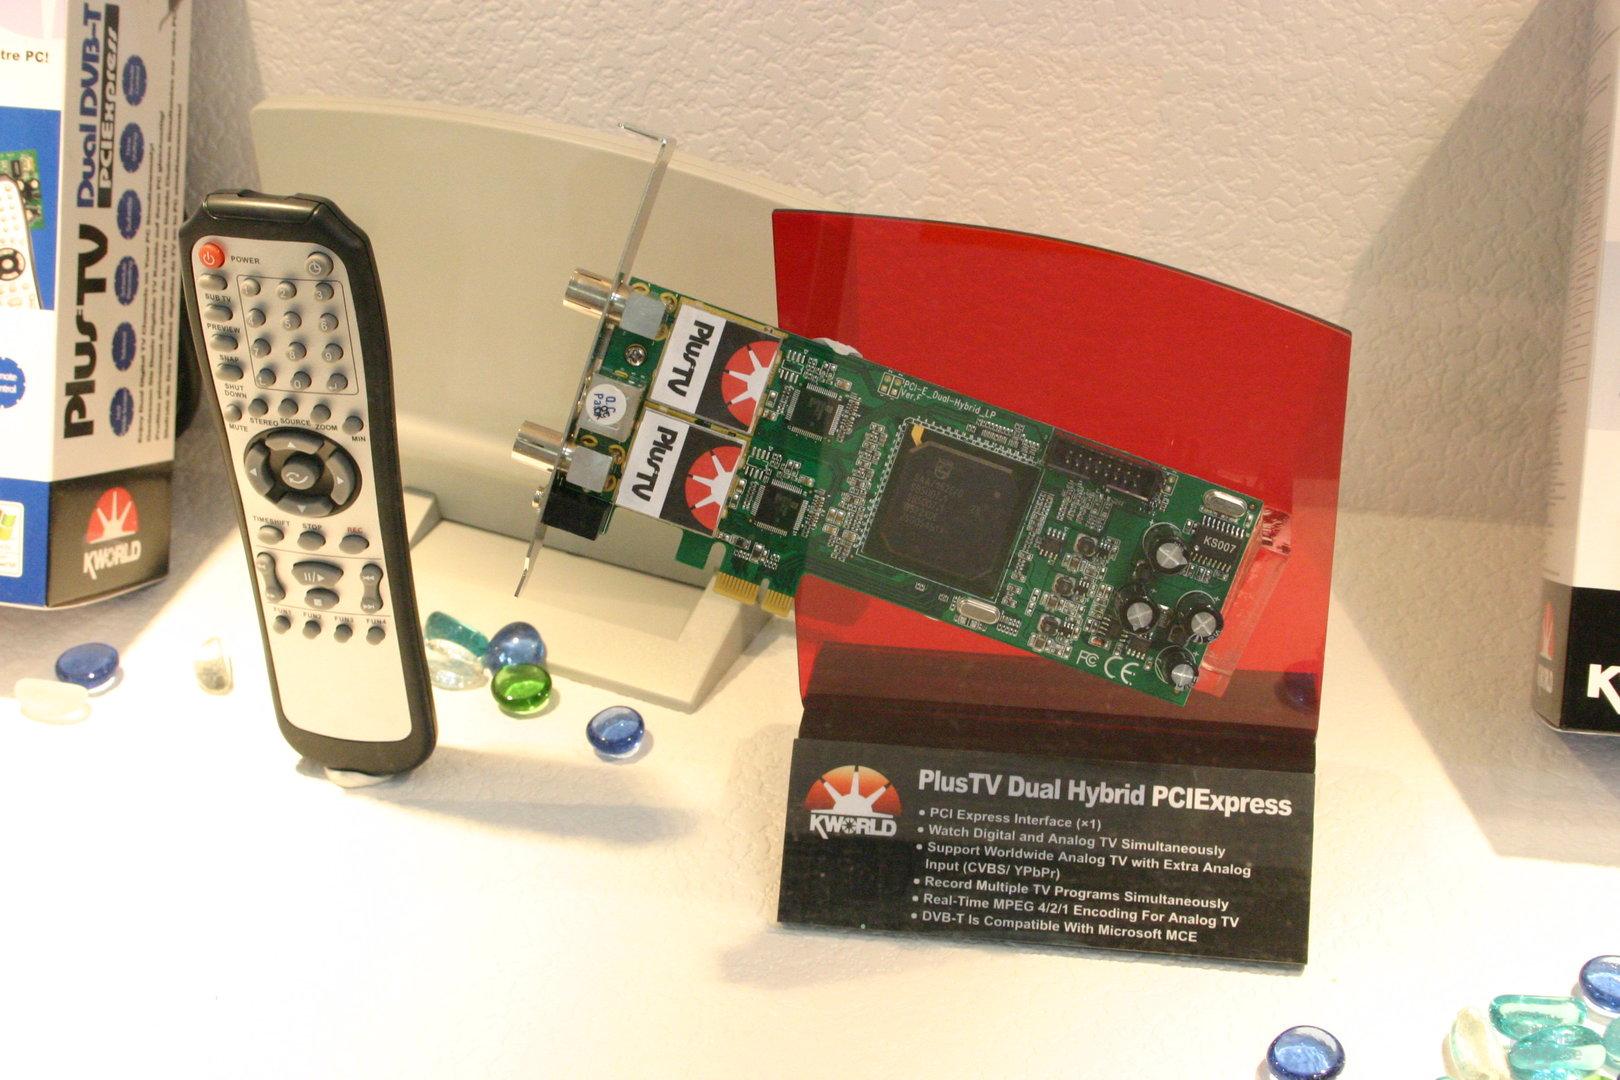 Kworld PlusTV Dual Hybrid PCIExpress (DVB-T, Analog)